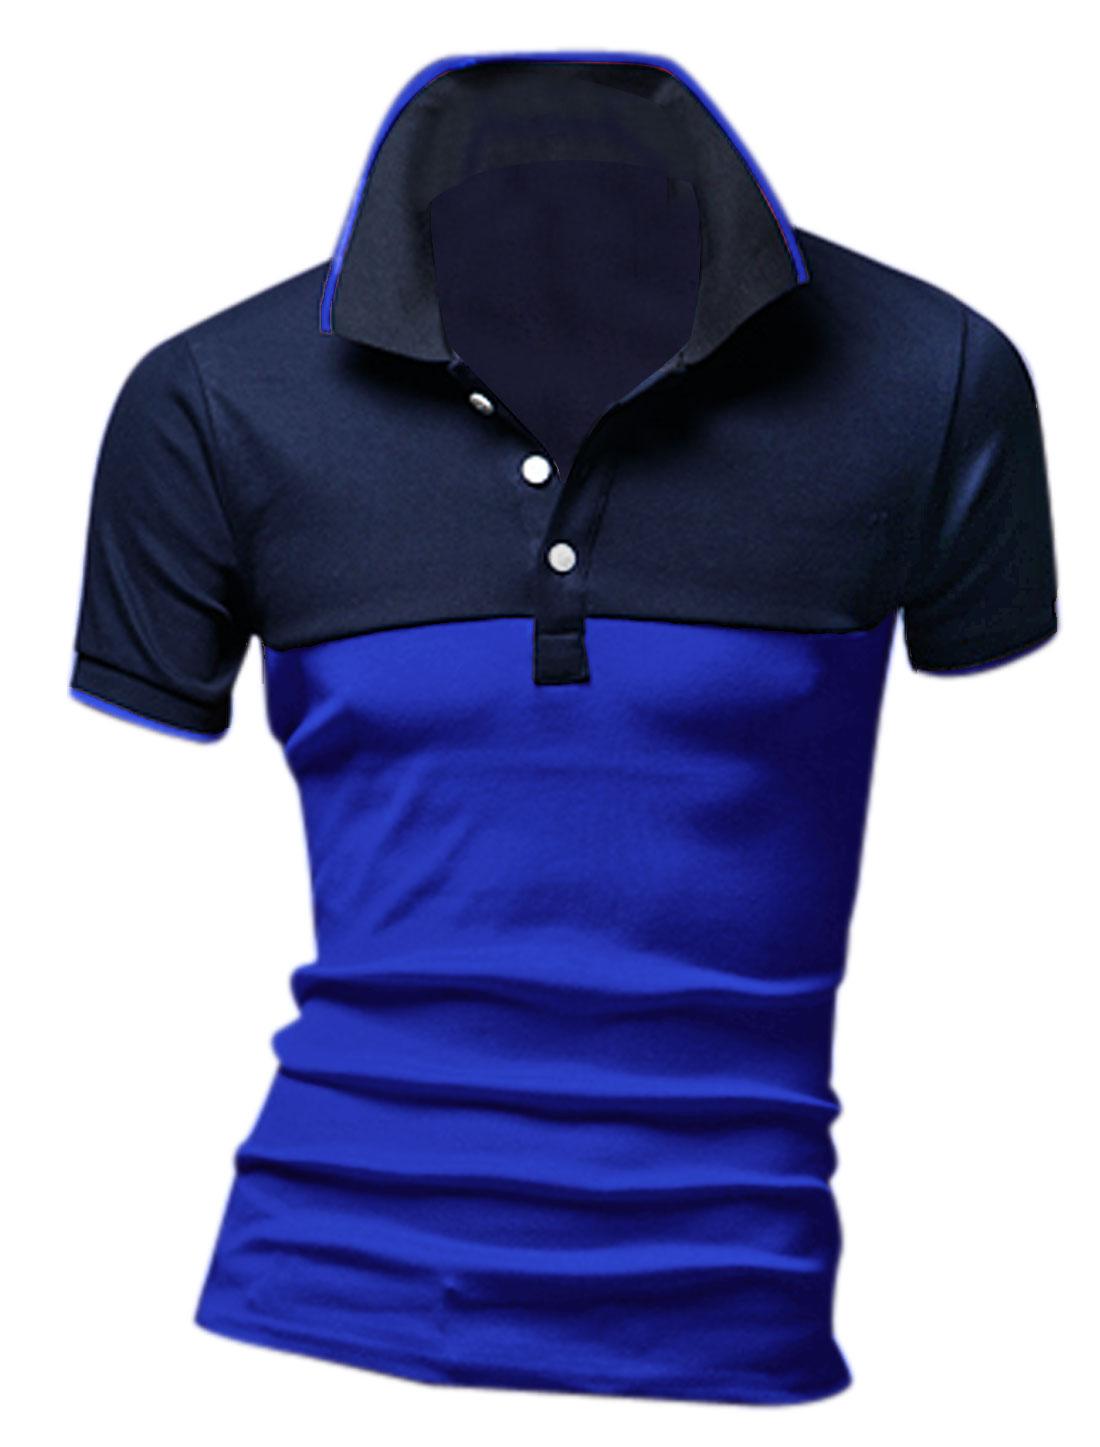 Man's Ribbed Collar Cuffs 3-Button Summer Fit Polo Shirt Dark Blue M